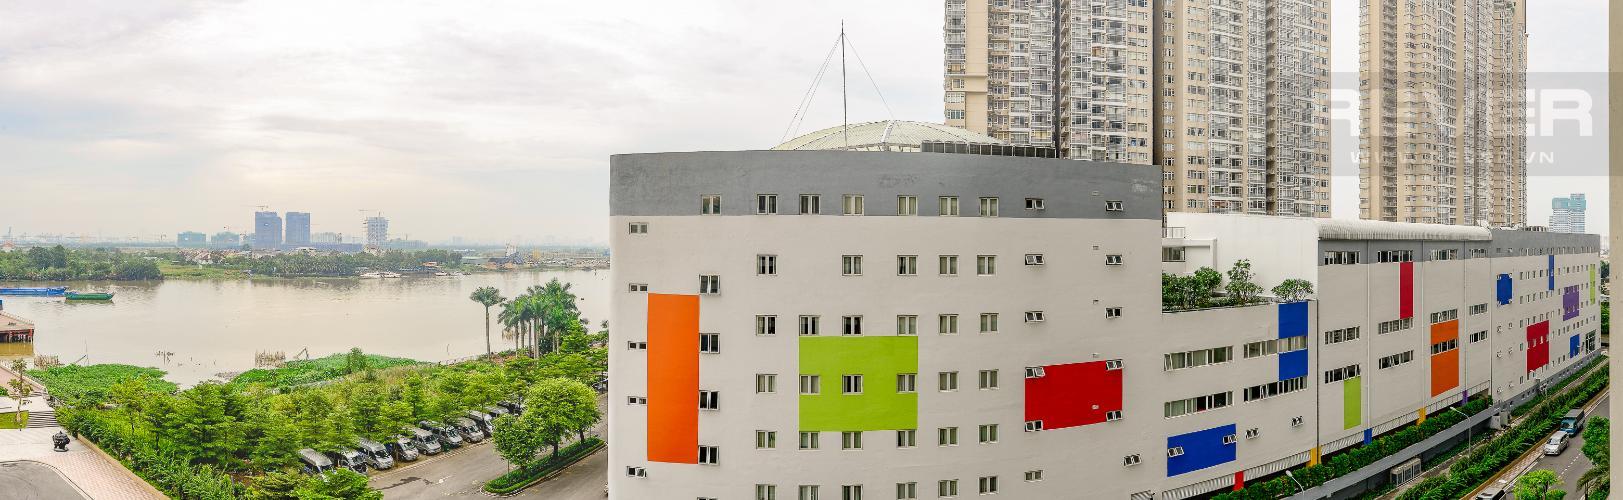 View Căn hộ Vinhomes Central Park 3 phòng ngủ tầng thấp Central 1